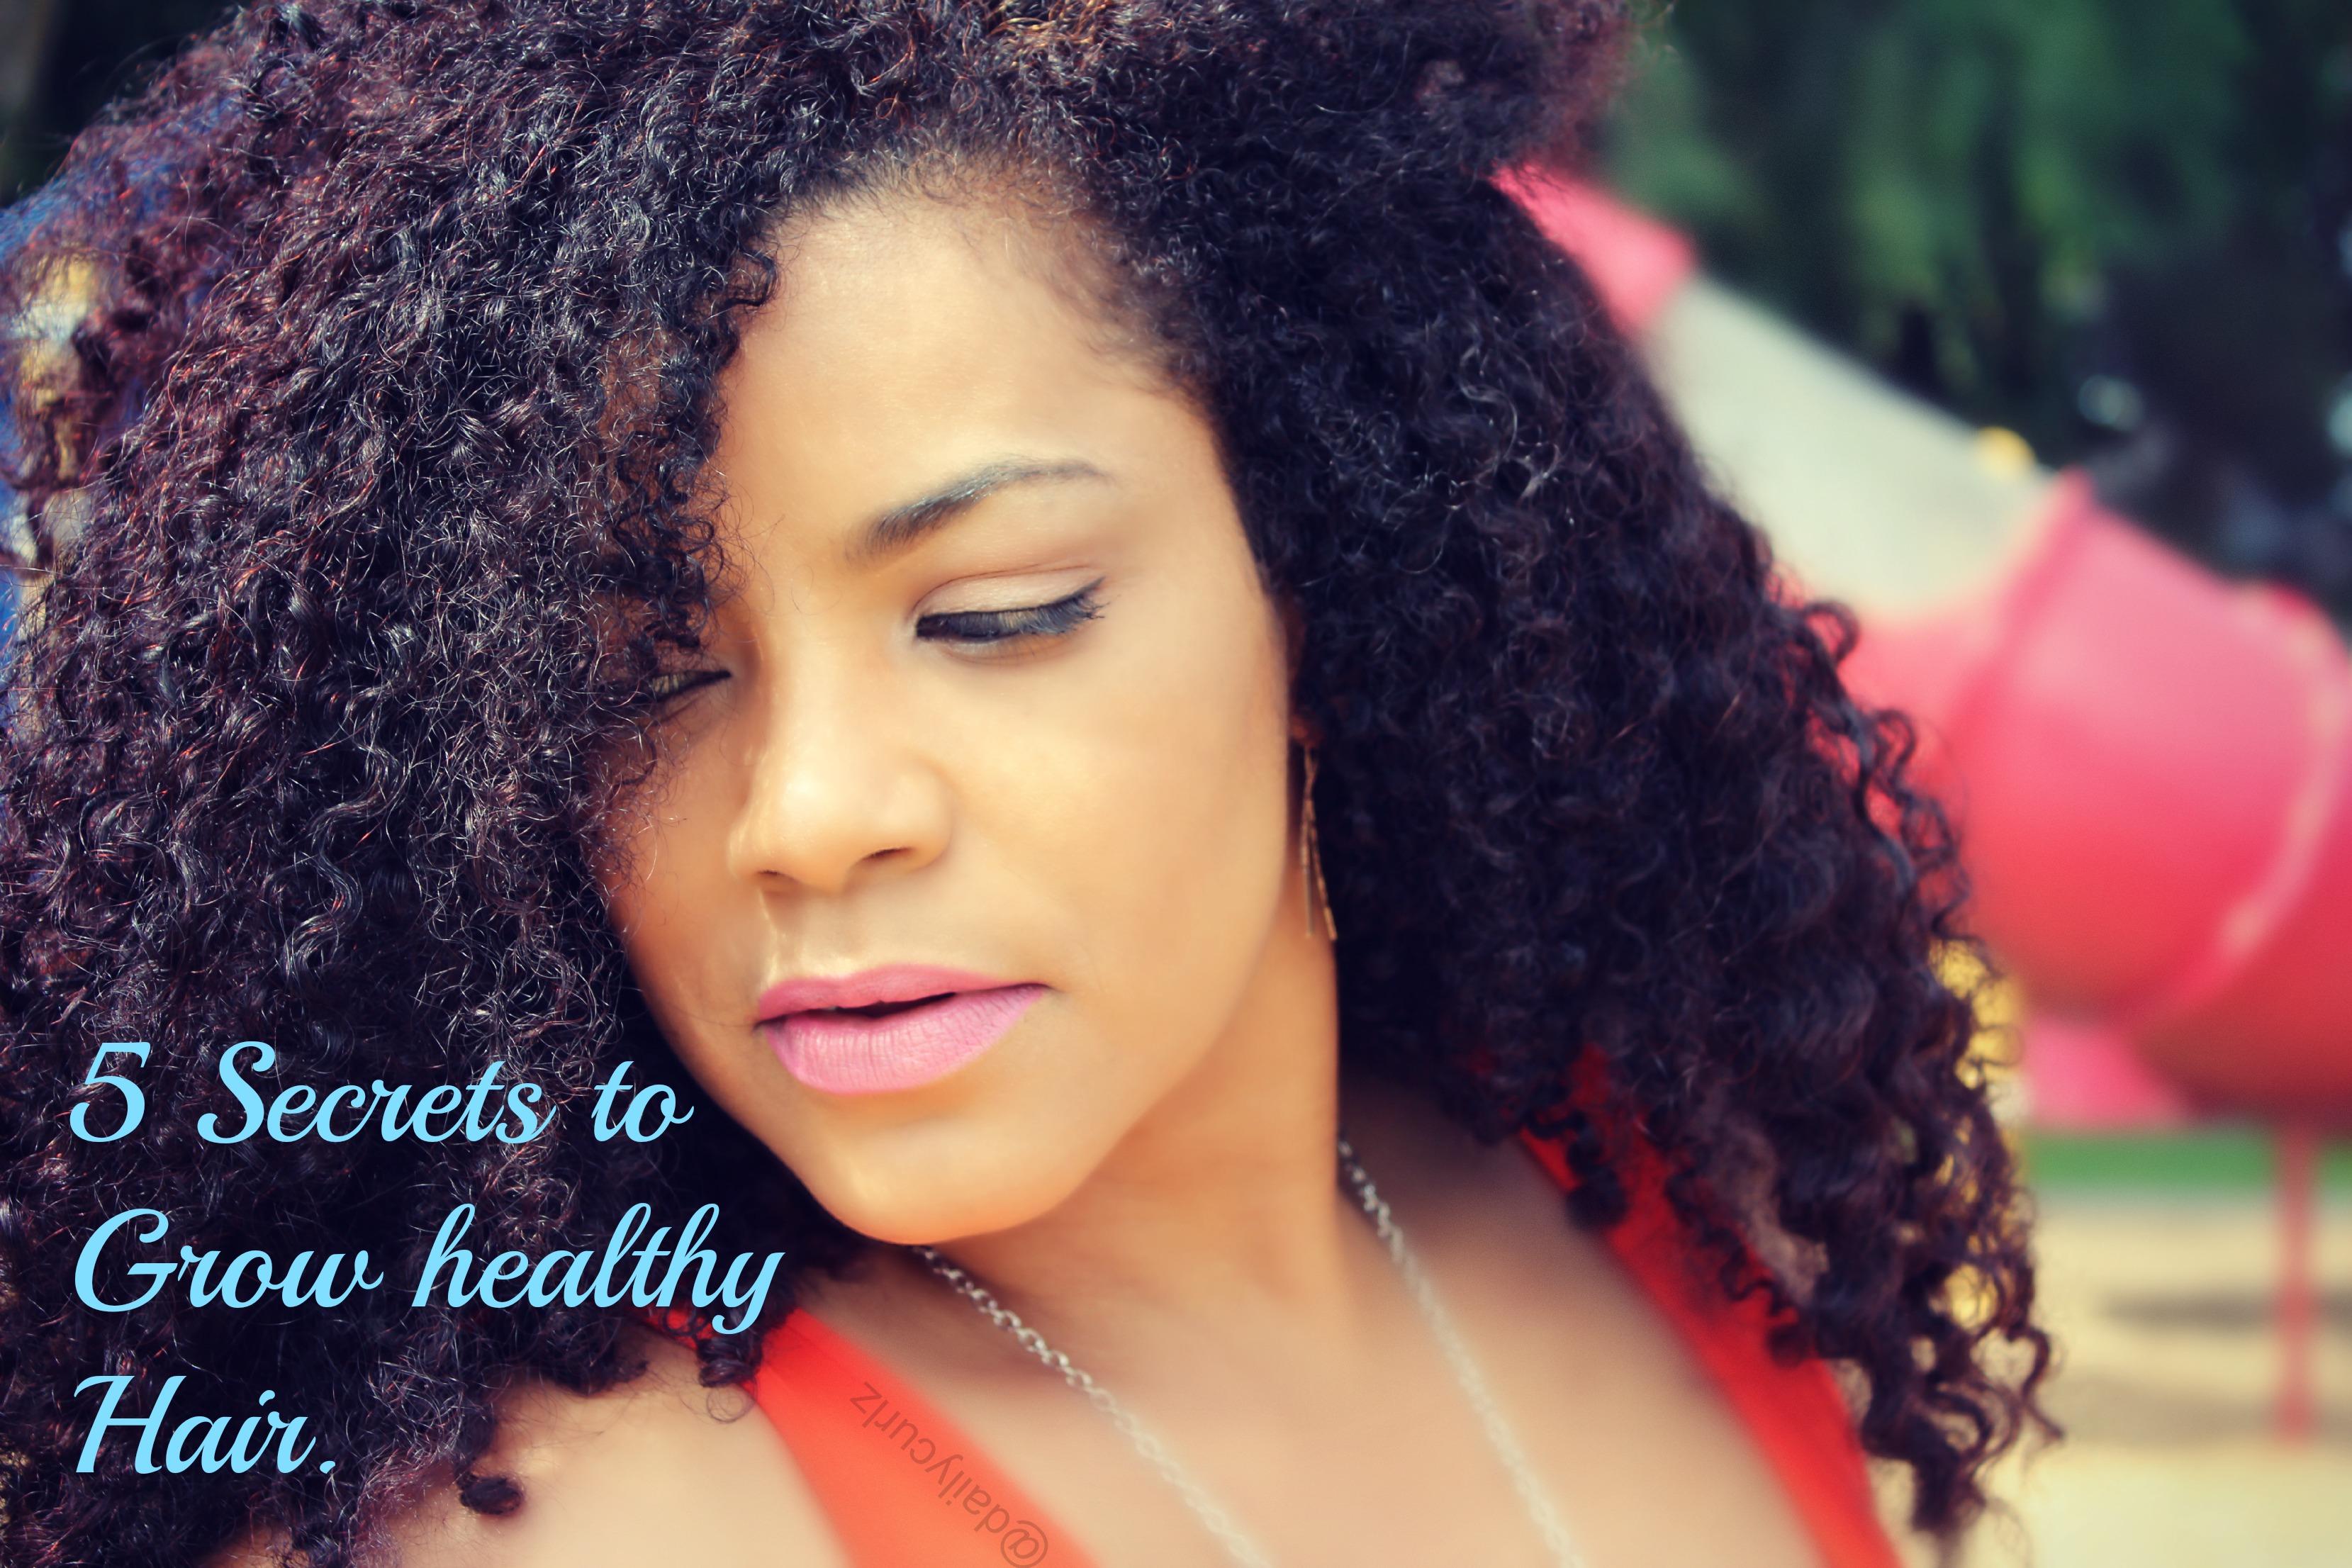 5 secrets to grow long hair/ 5 secretos para crecer tu cabello.